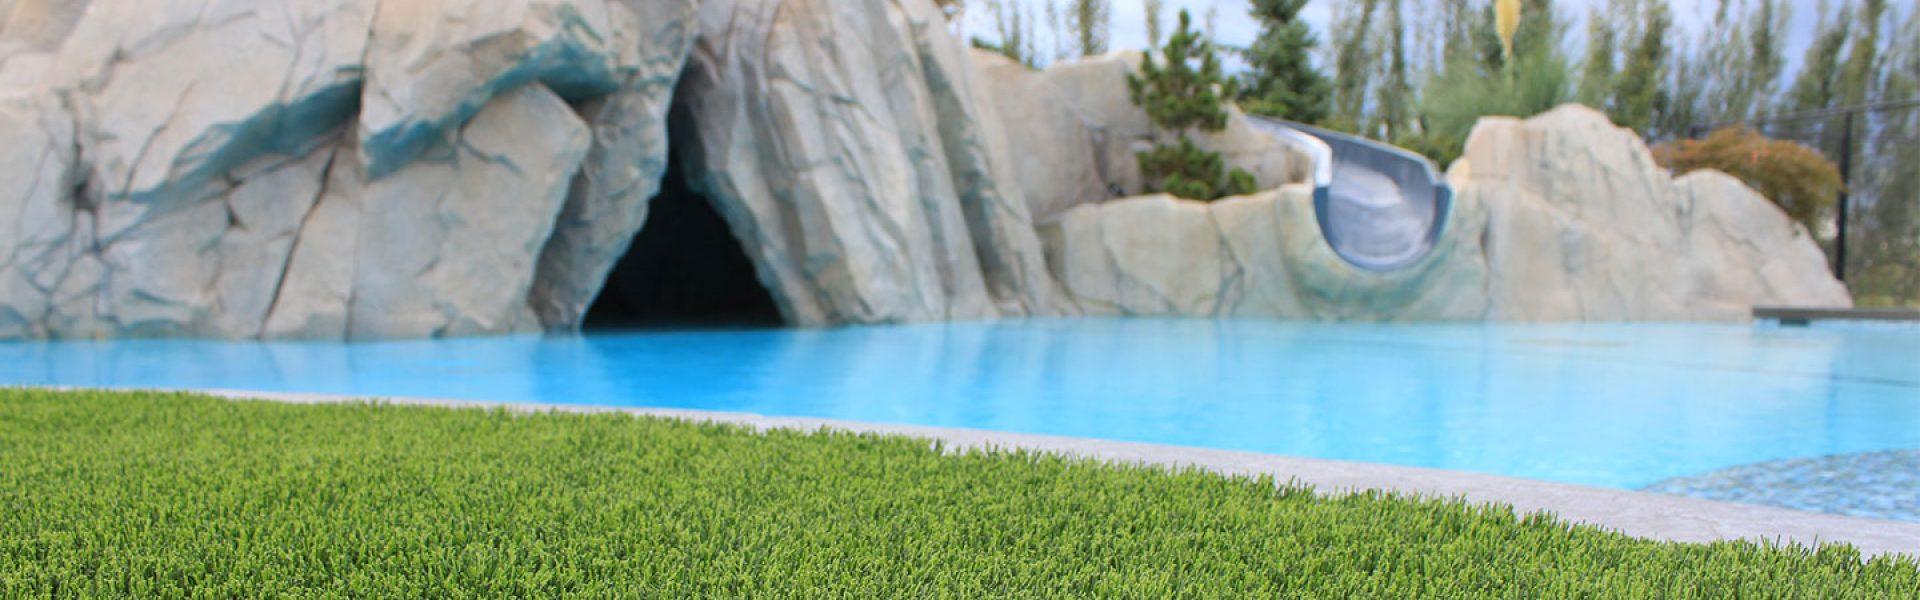 vancouver-artificial-grass